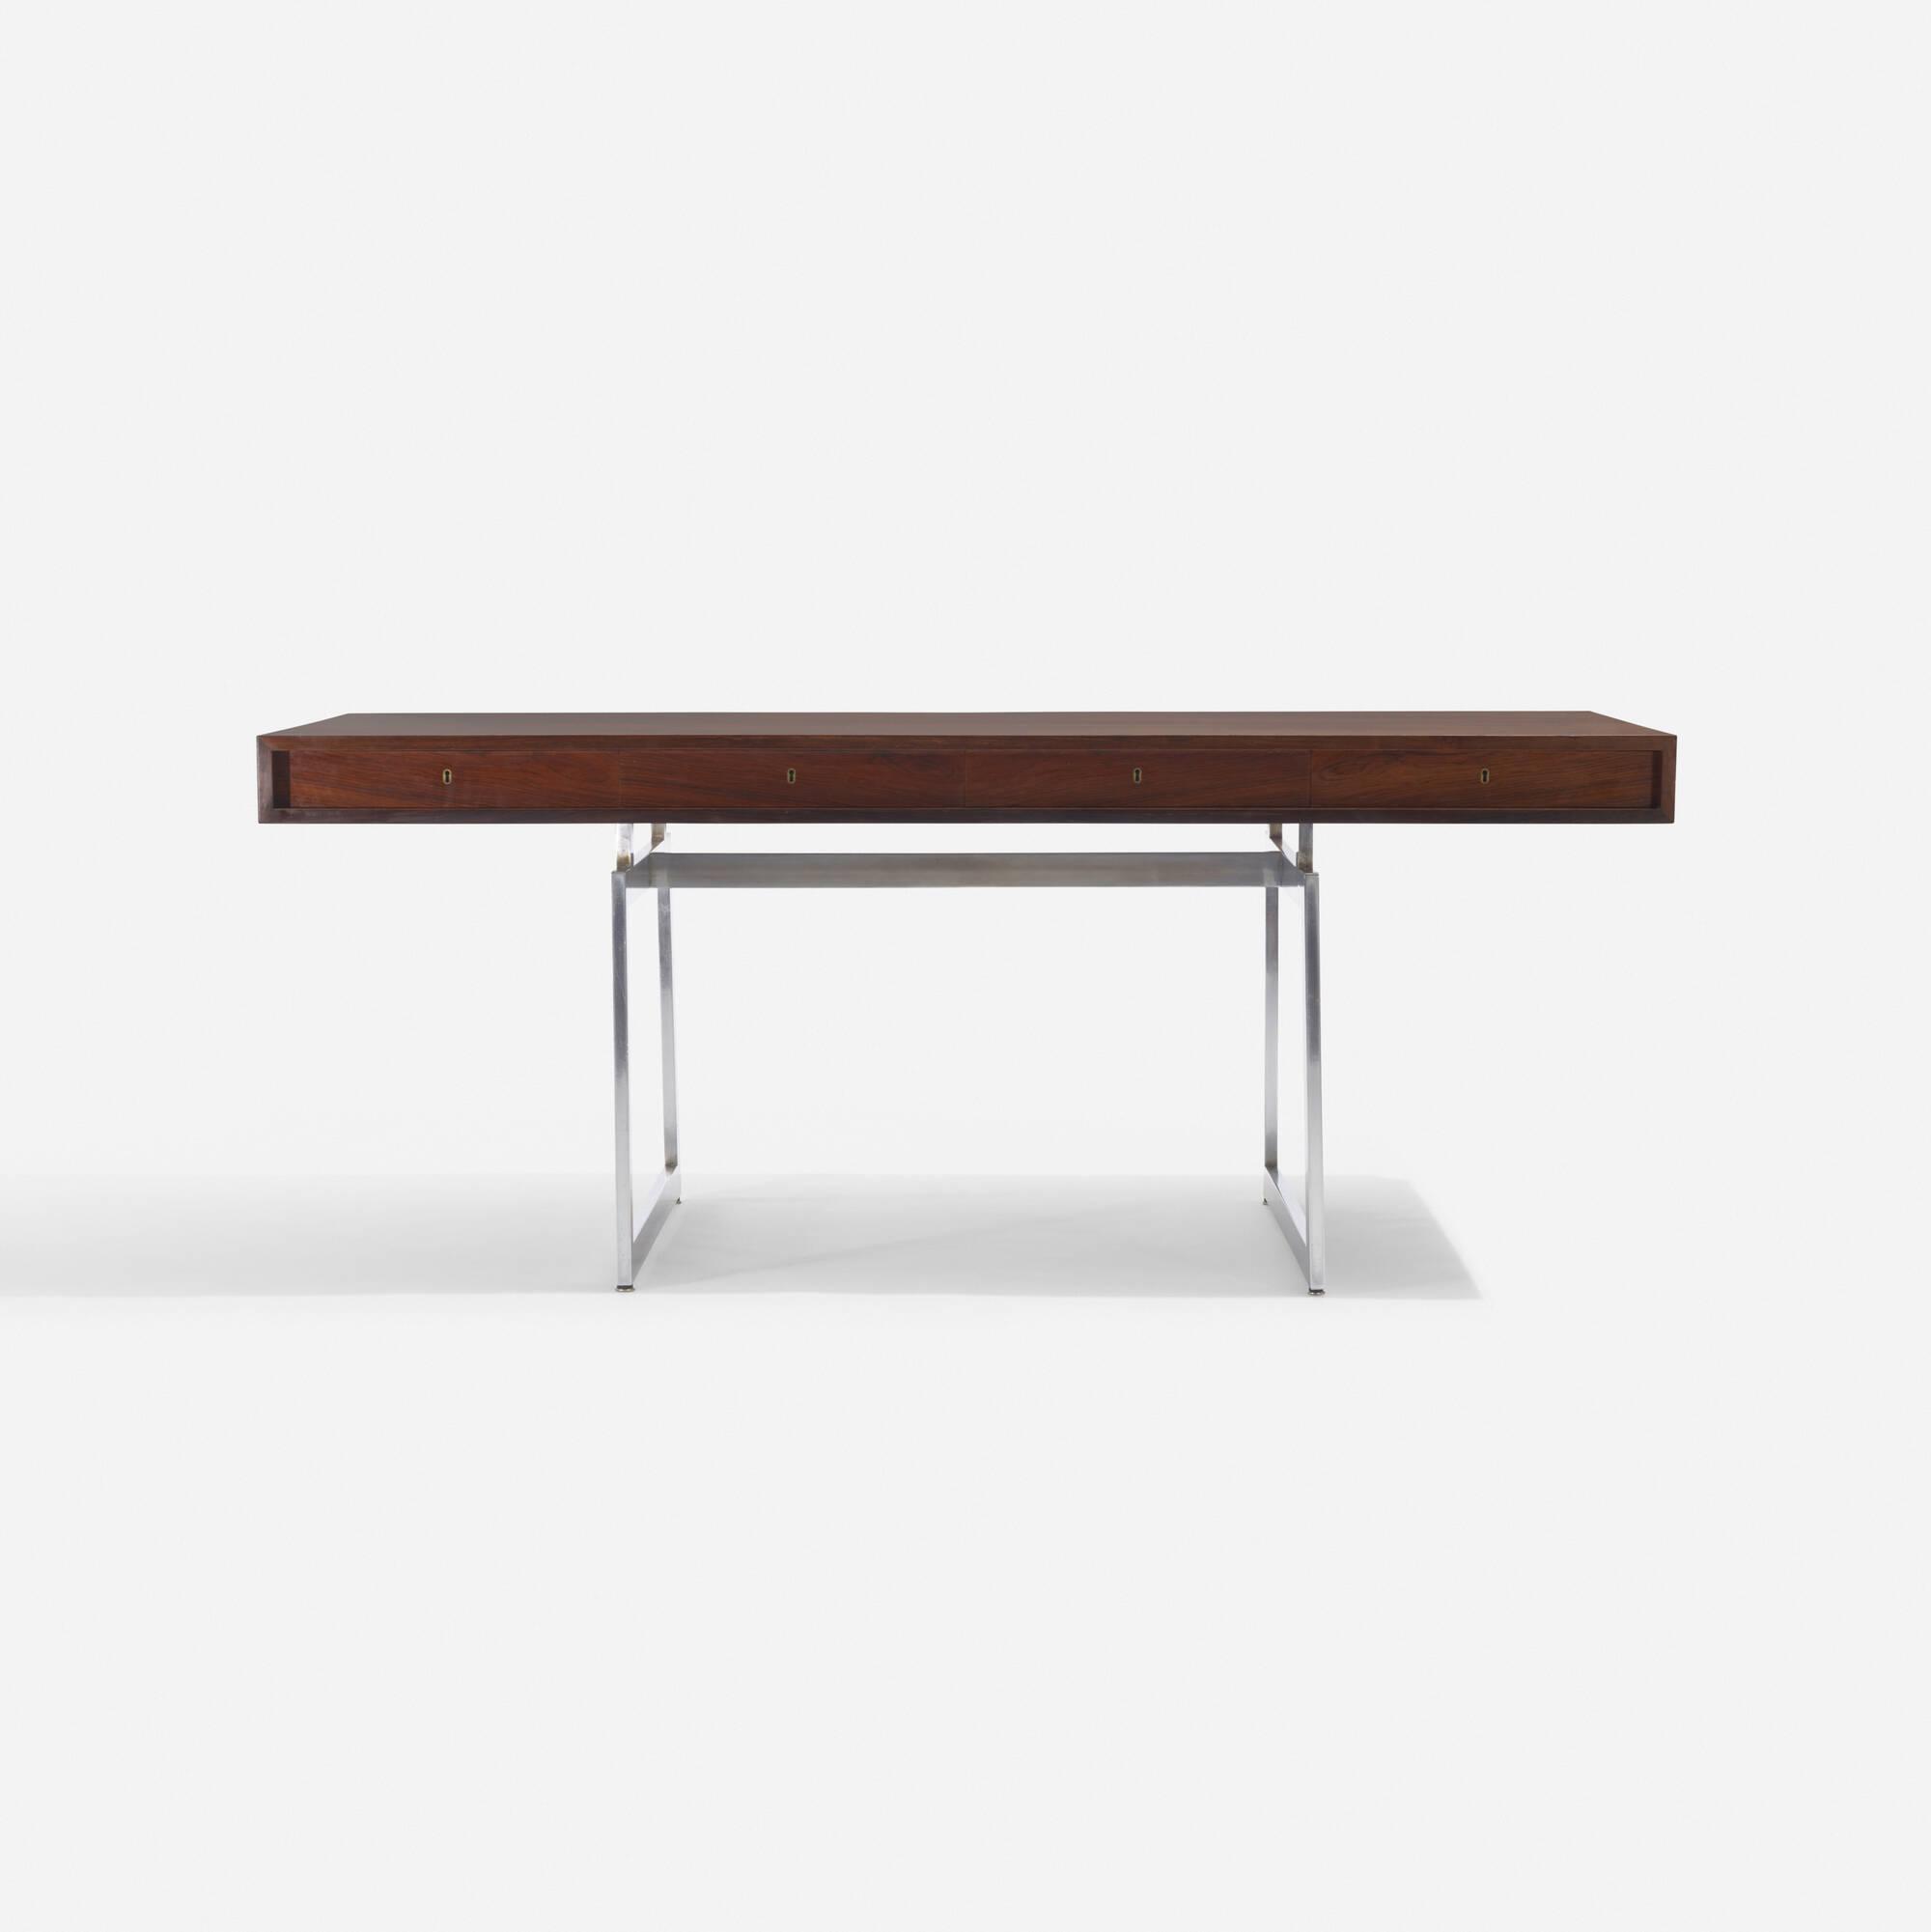 268: Bodil Kjaer / desk (2 of 3)